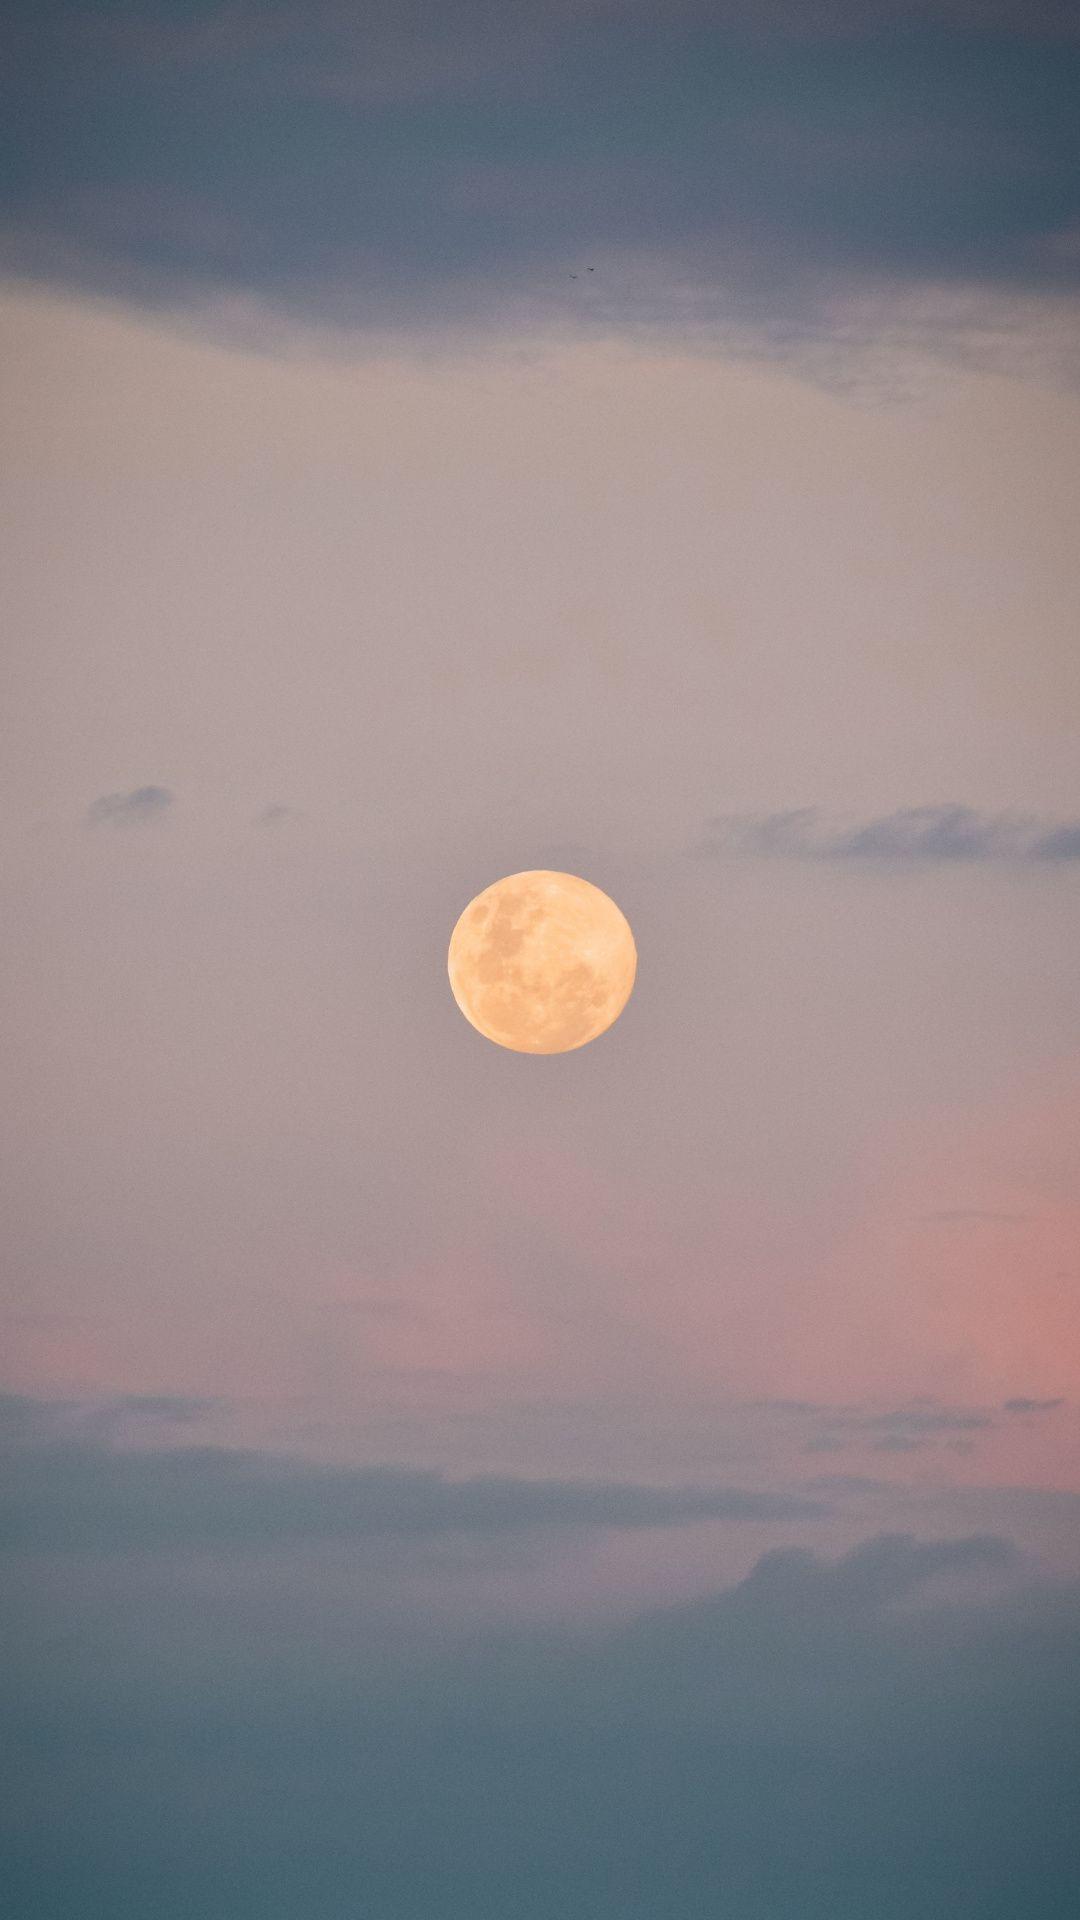 Full moon, sky, clouds, sunrise, 1080x1920 wallpaper